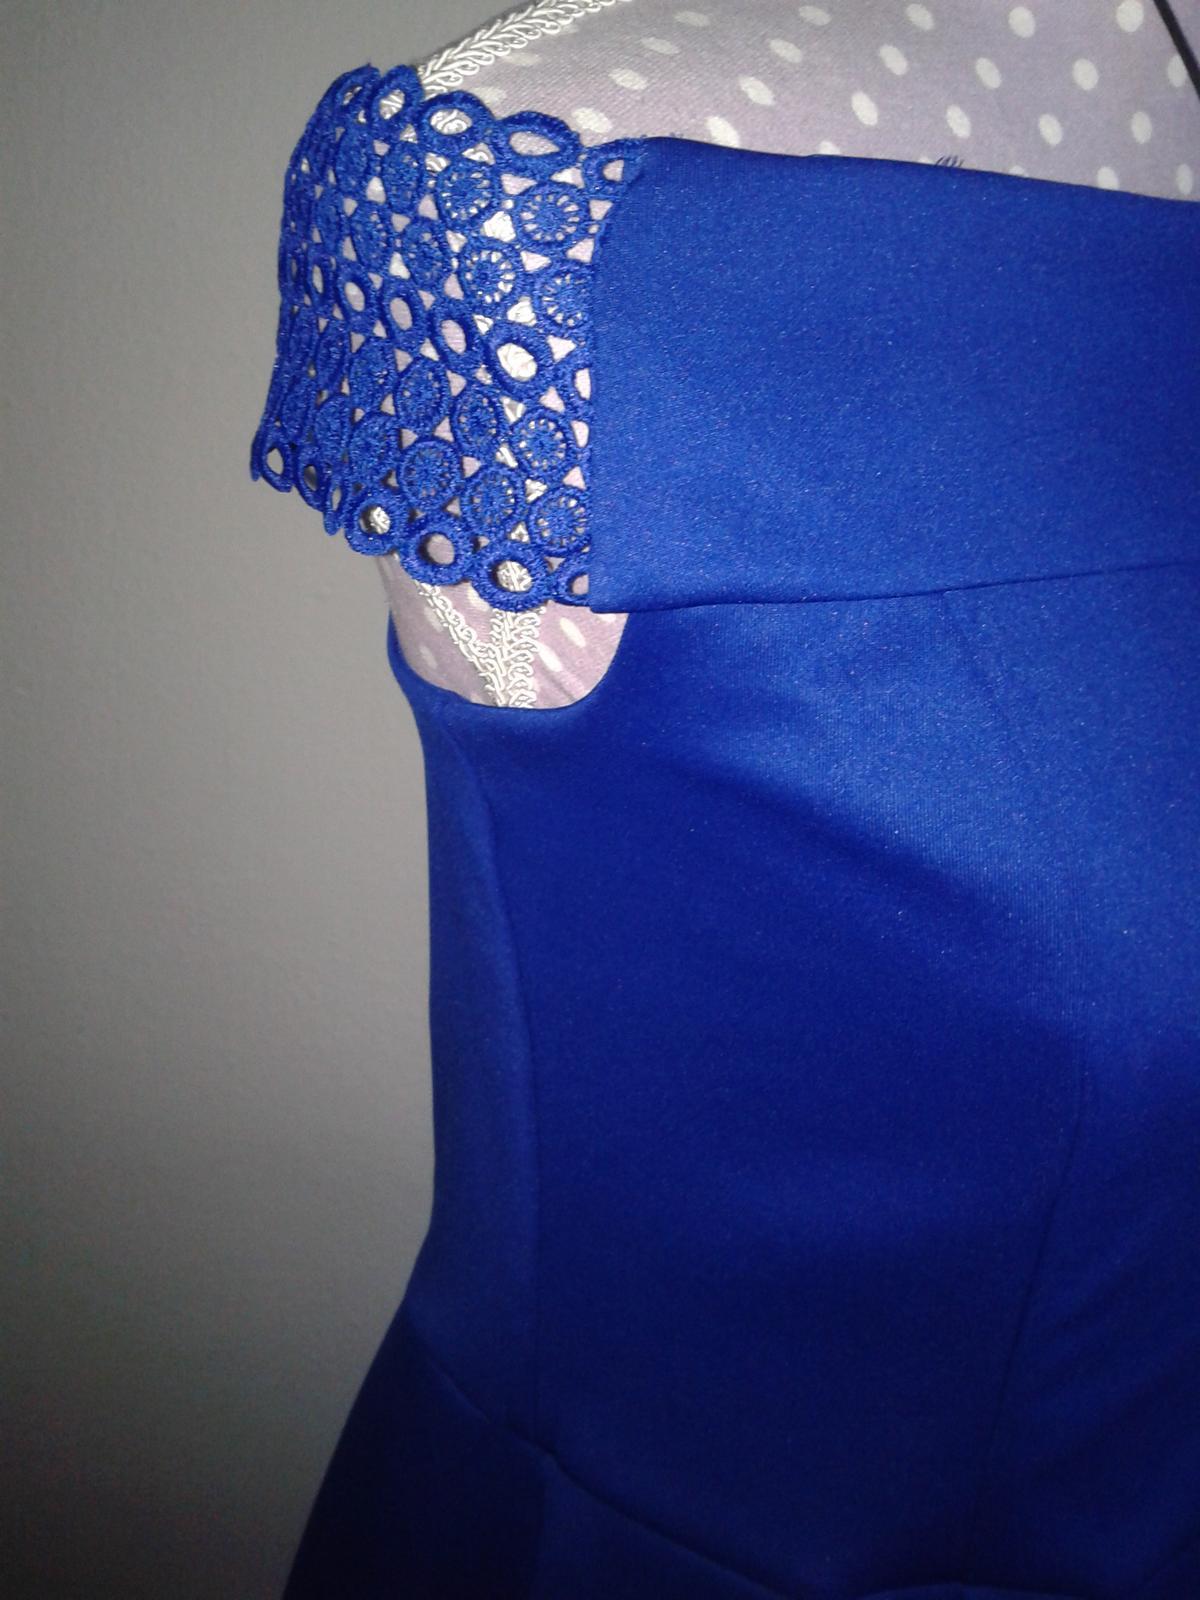 jasnomodré šaty cez ramená Dorothy Perkins veľ. L/42 - Obrázok č. 3